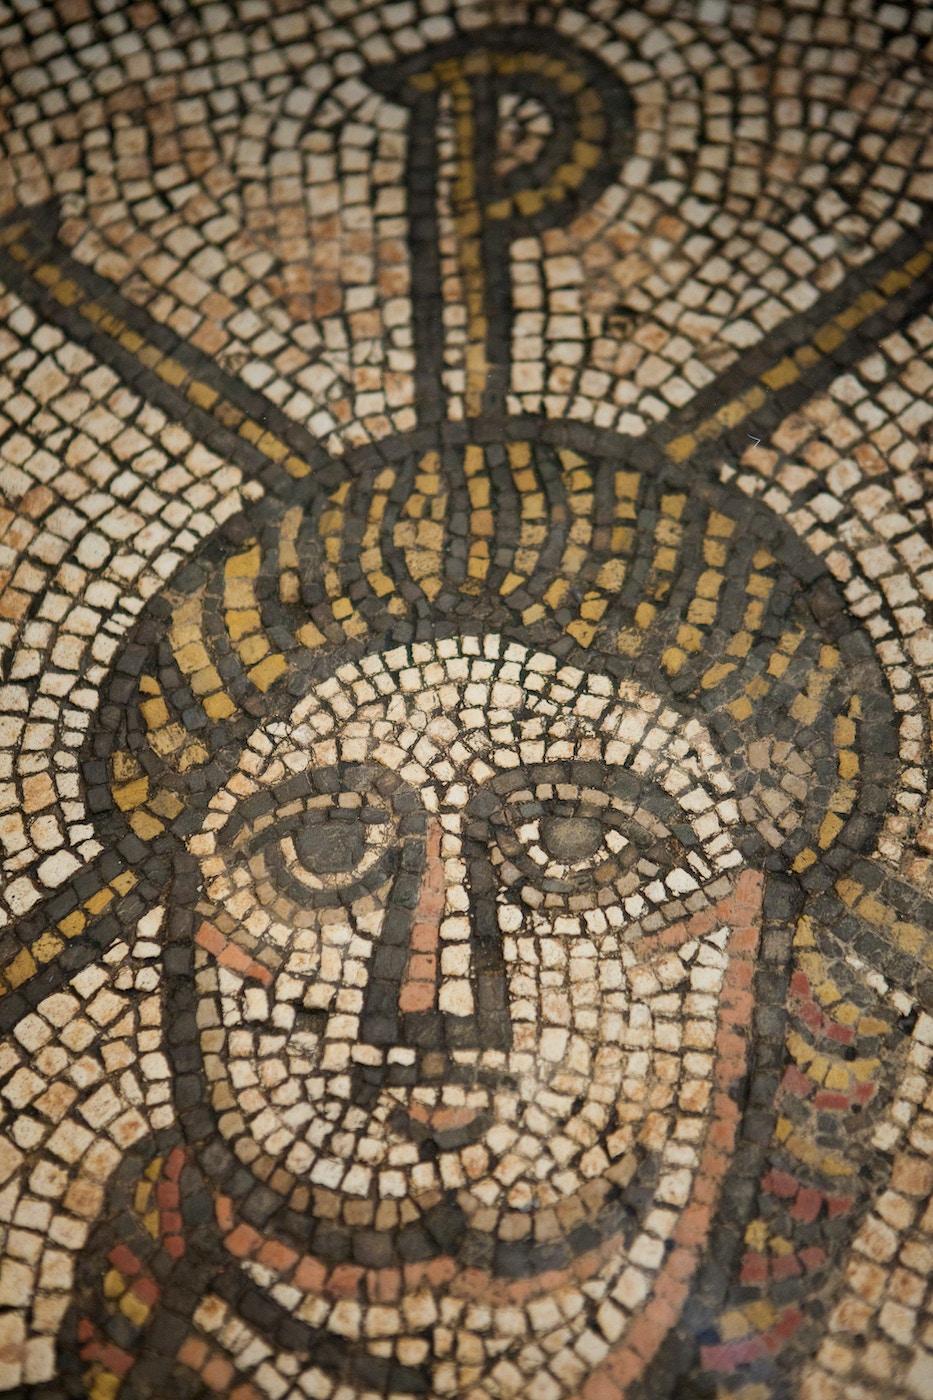 Hinton St Mary Mosaic: Detail